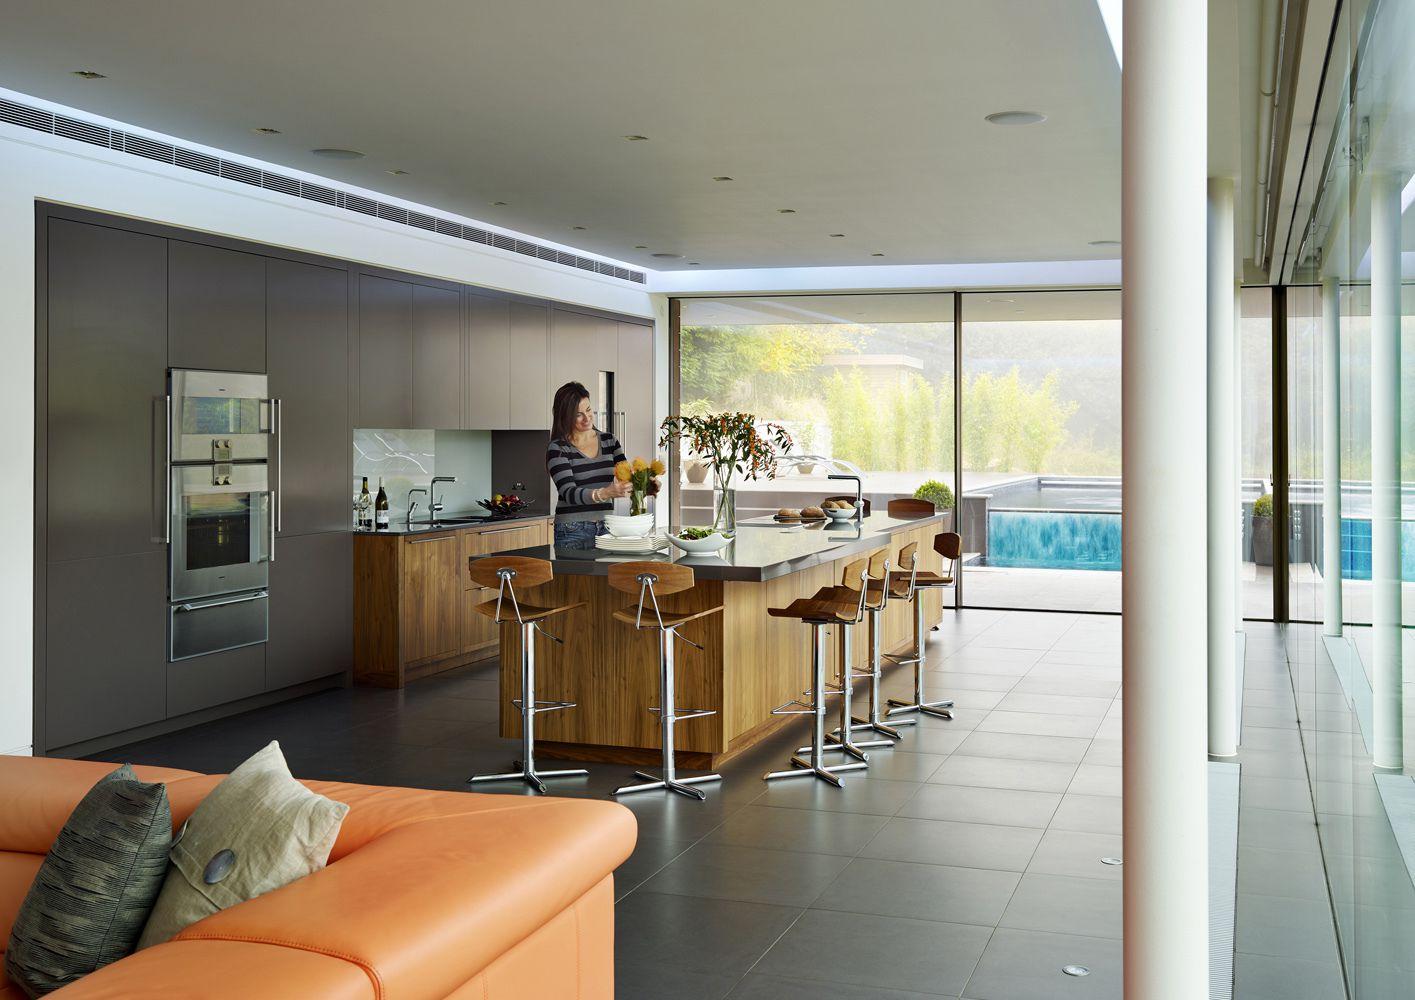 51b9e75ab3fc4b430e00000e_white-lodge-dyergrimes-architects_wl11chung